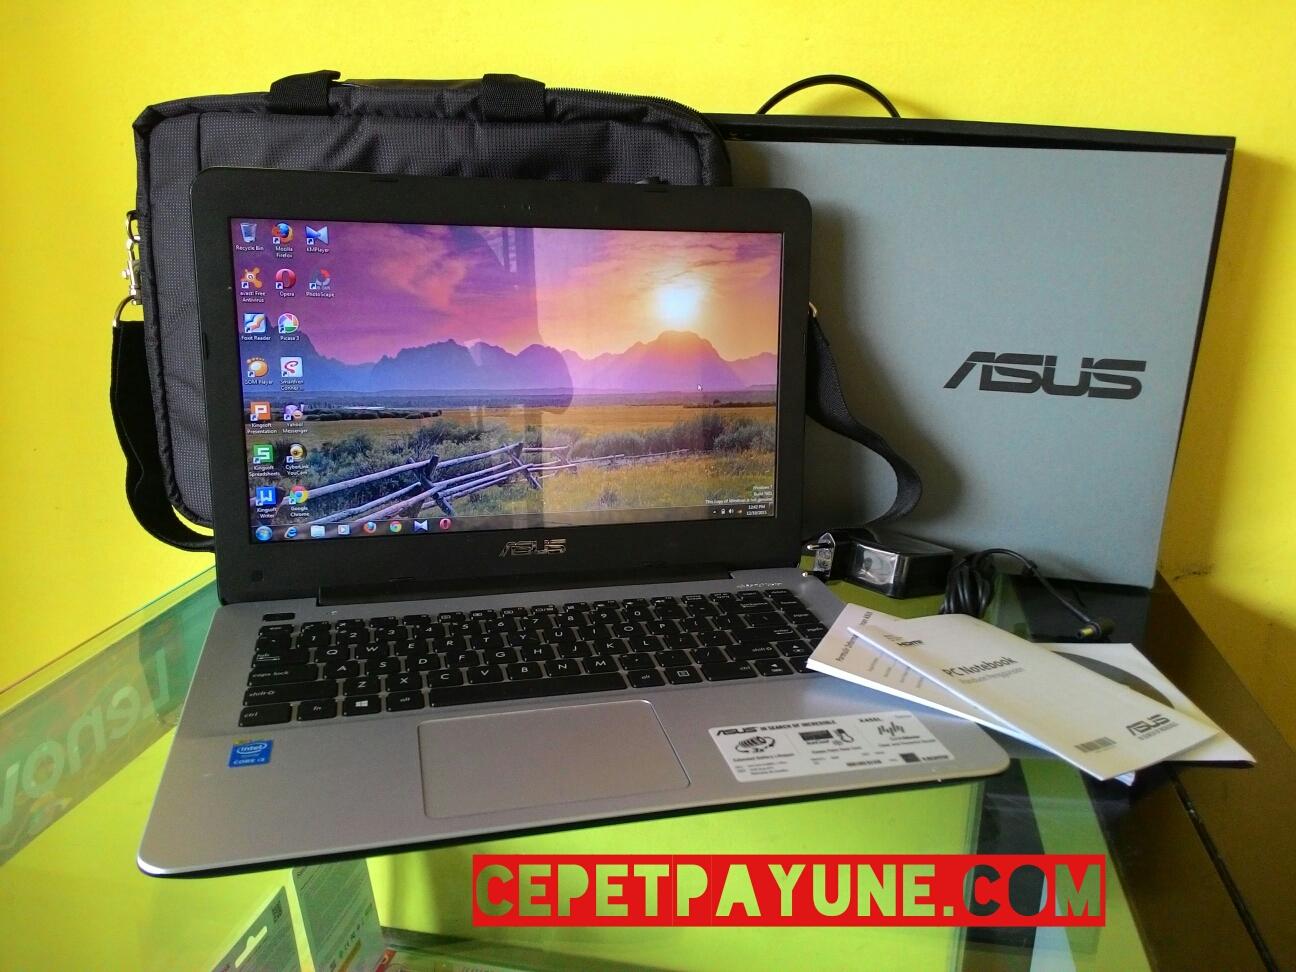 Jual Asus A455la Welcome To Lcd Led 140 Laptop X451 X451c X451ca X451m X451ma Series Intel Core I3 4005u Fullset Seminggu Pakai 98